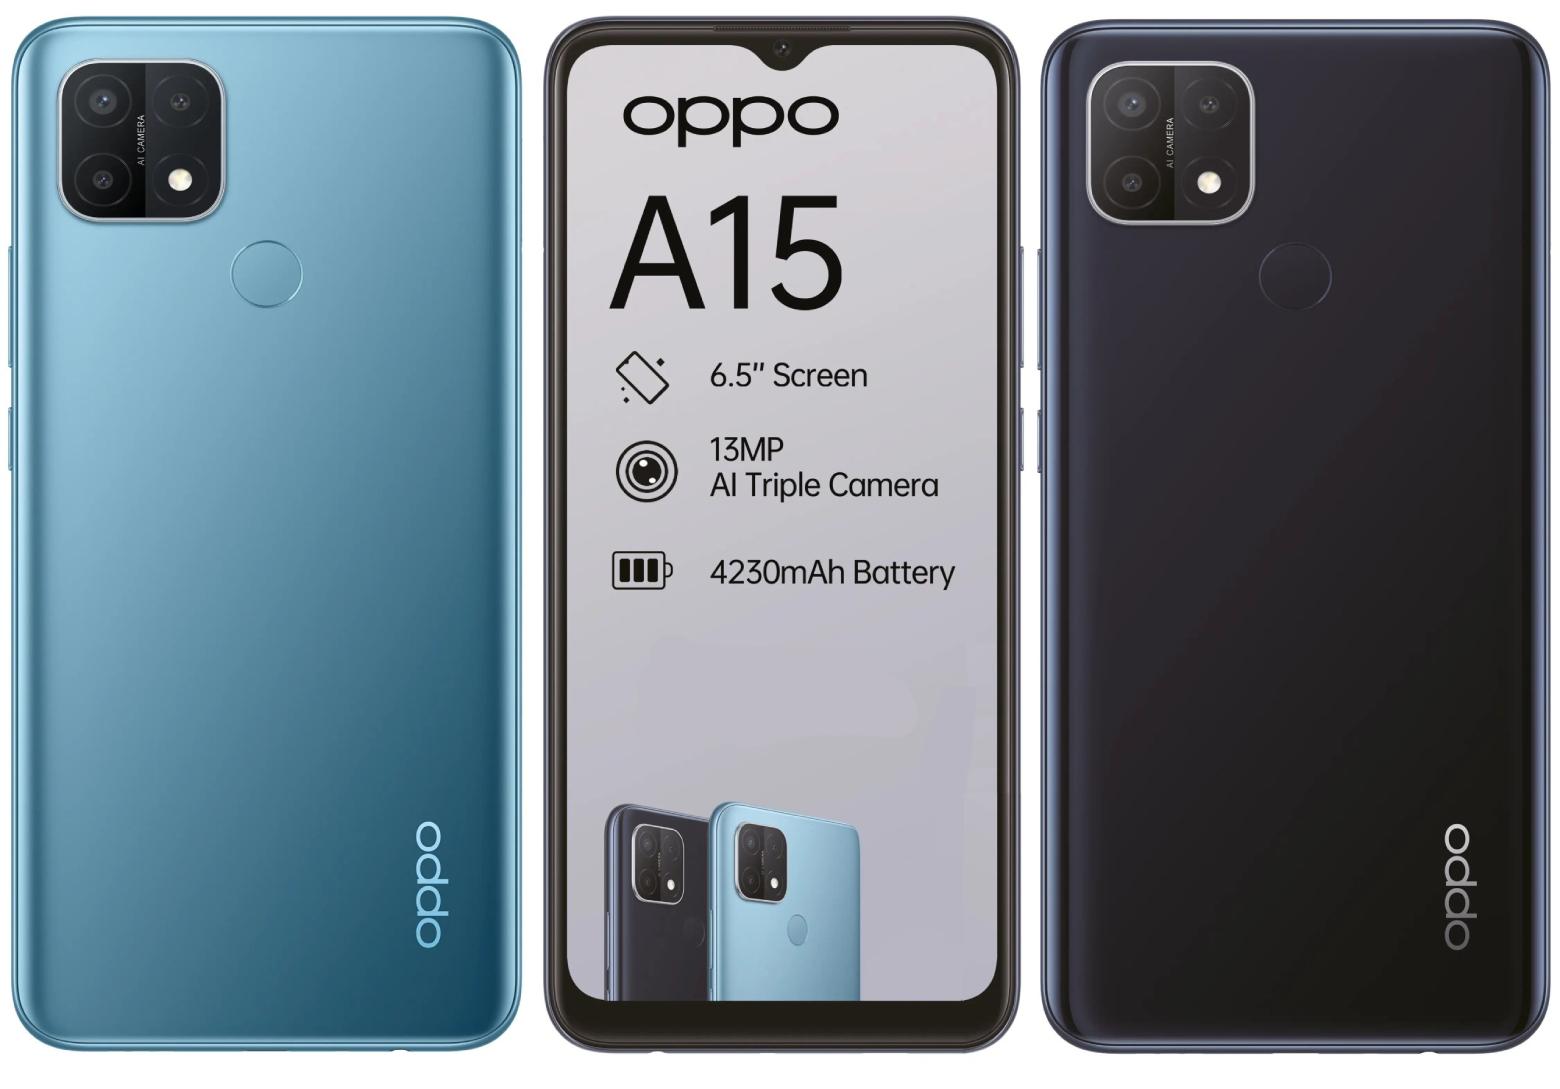 Oppo A15 2 GB 32 GB Cep Telefonu Kamera Özellikleri